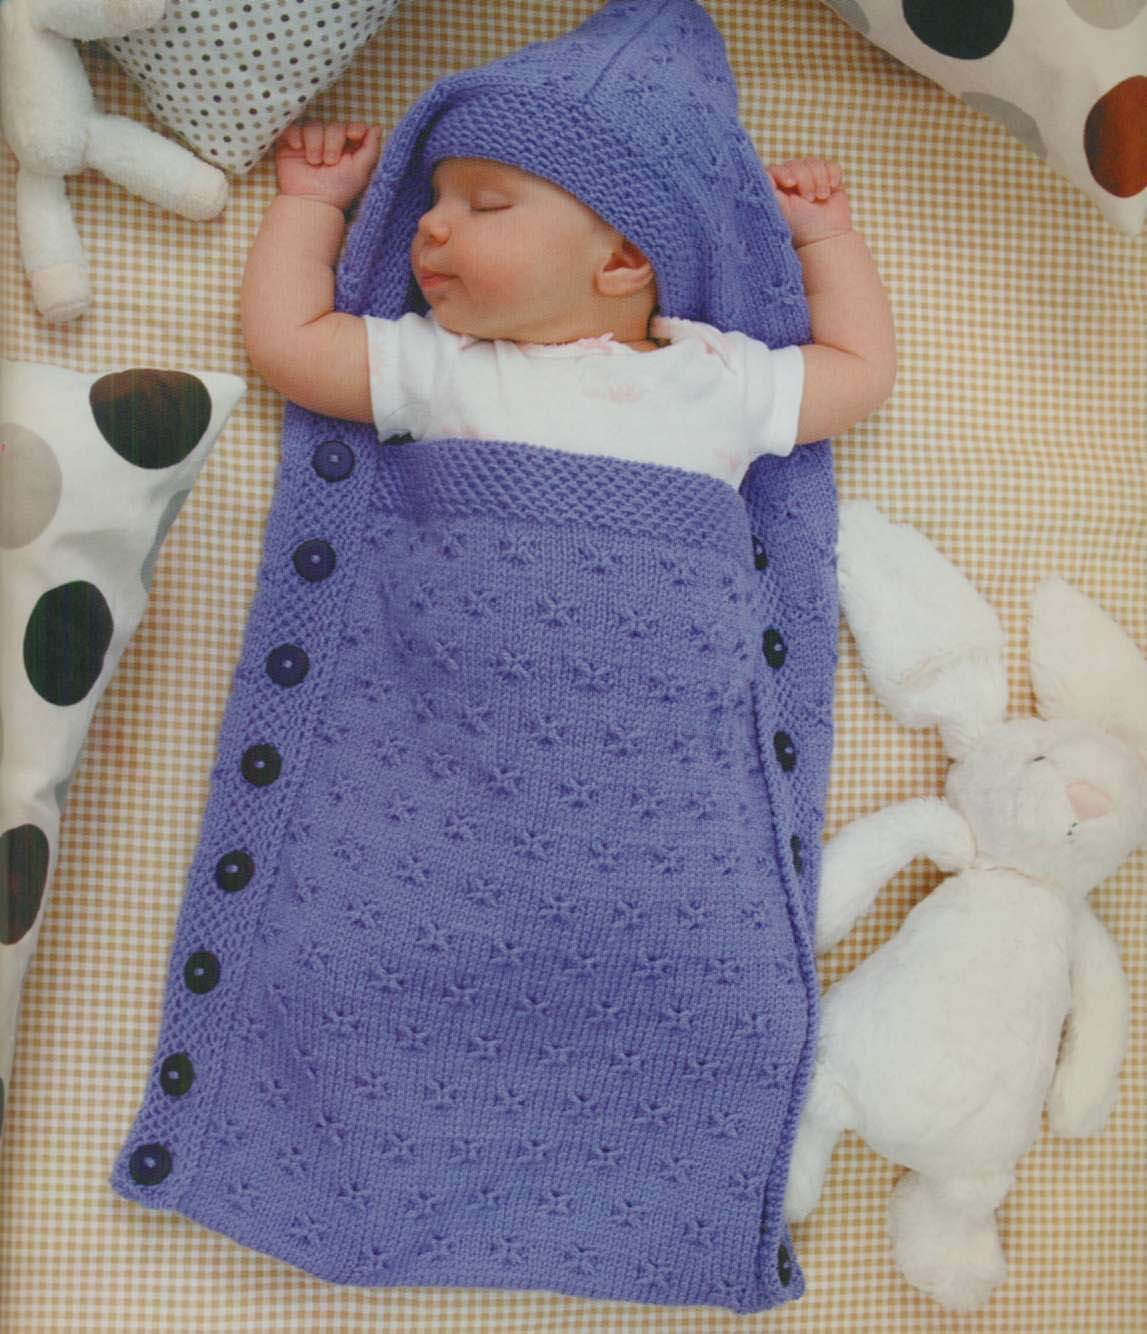 вязаный спальный мешок для младенца